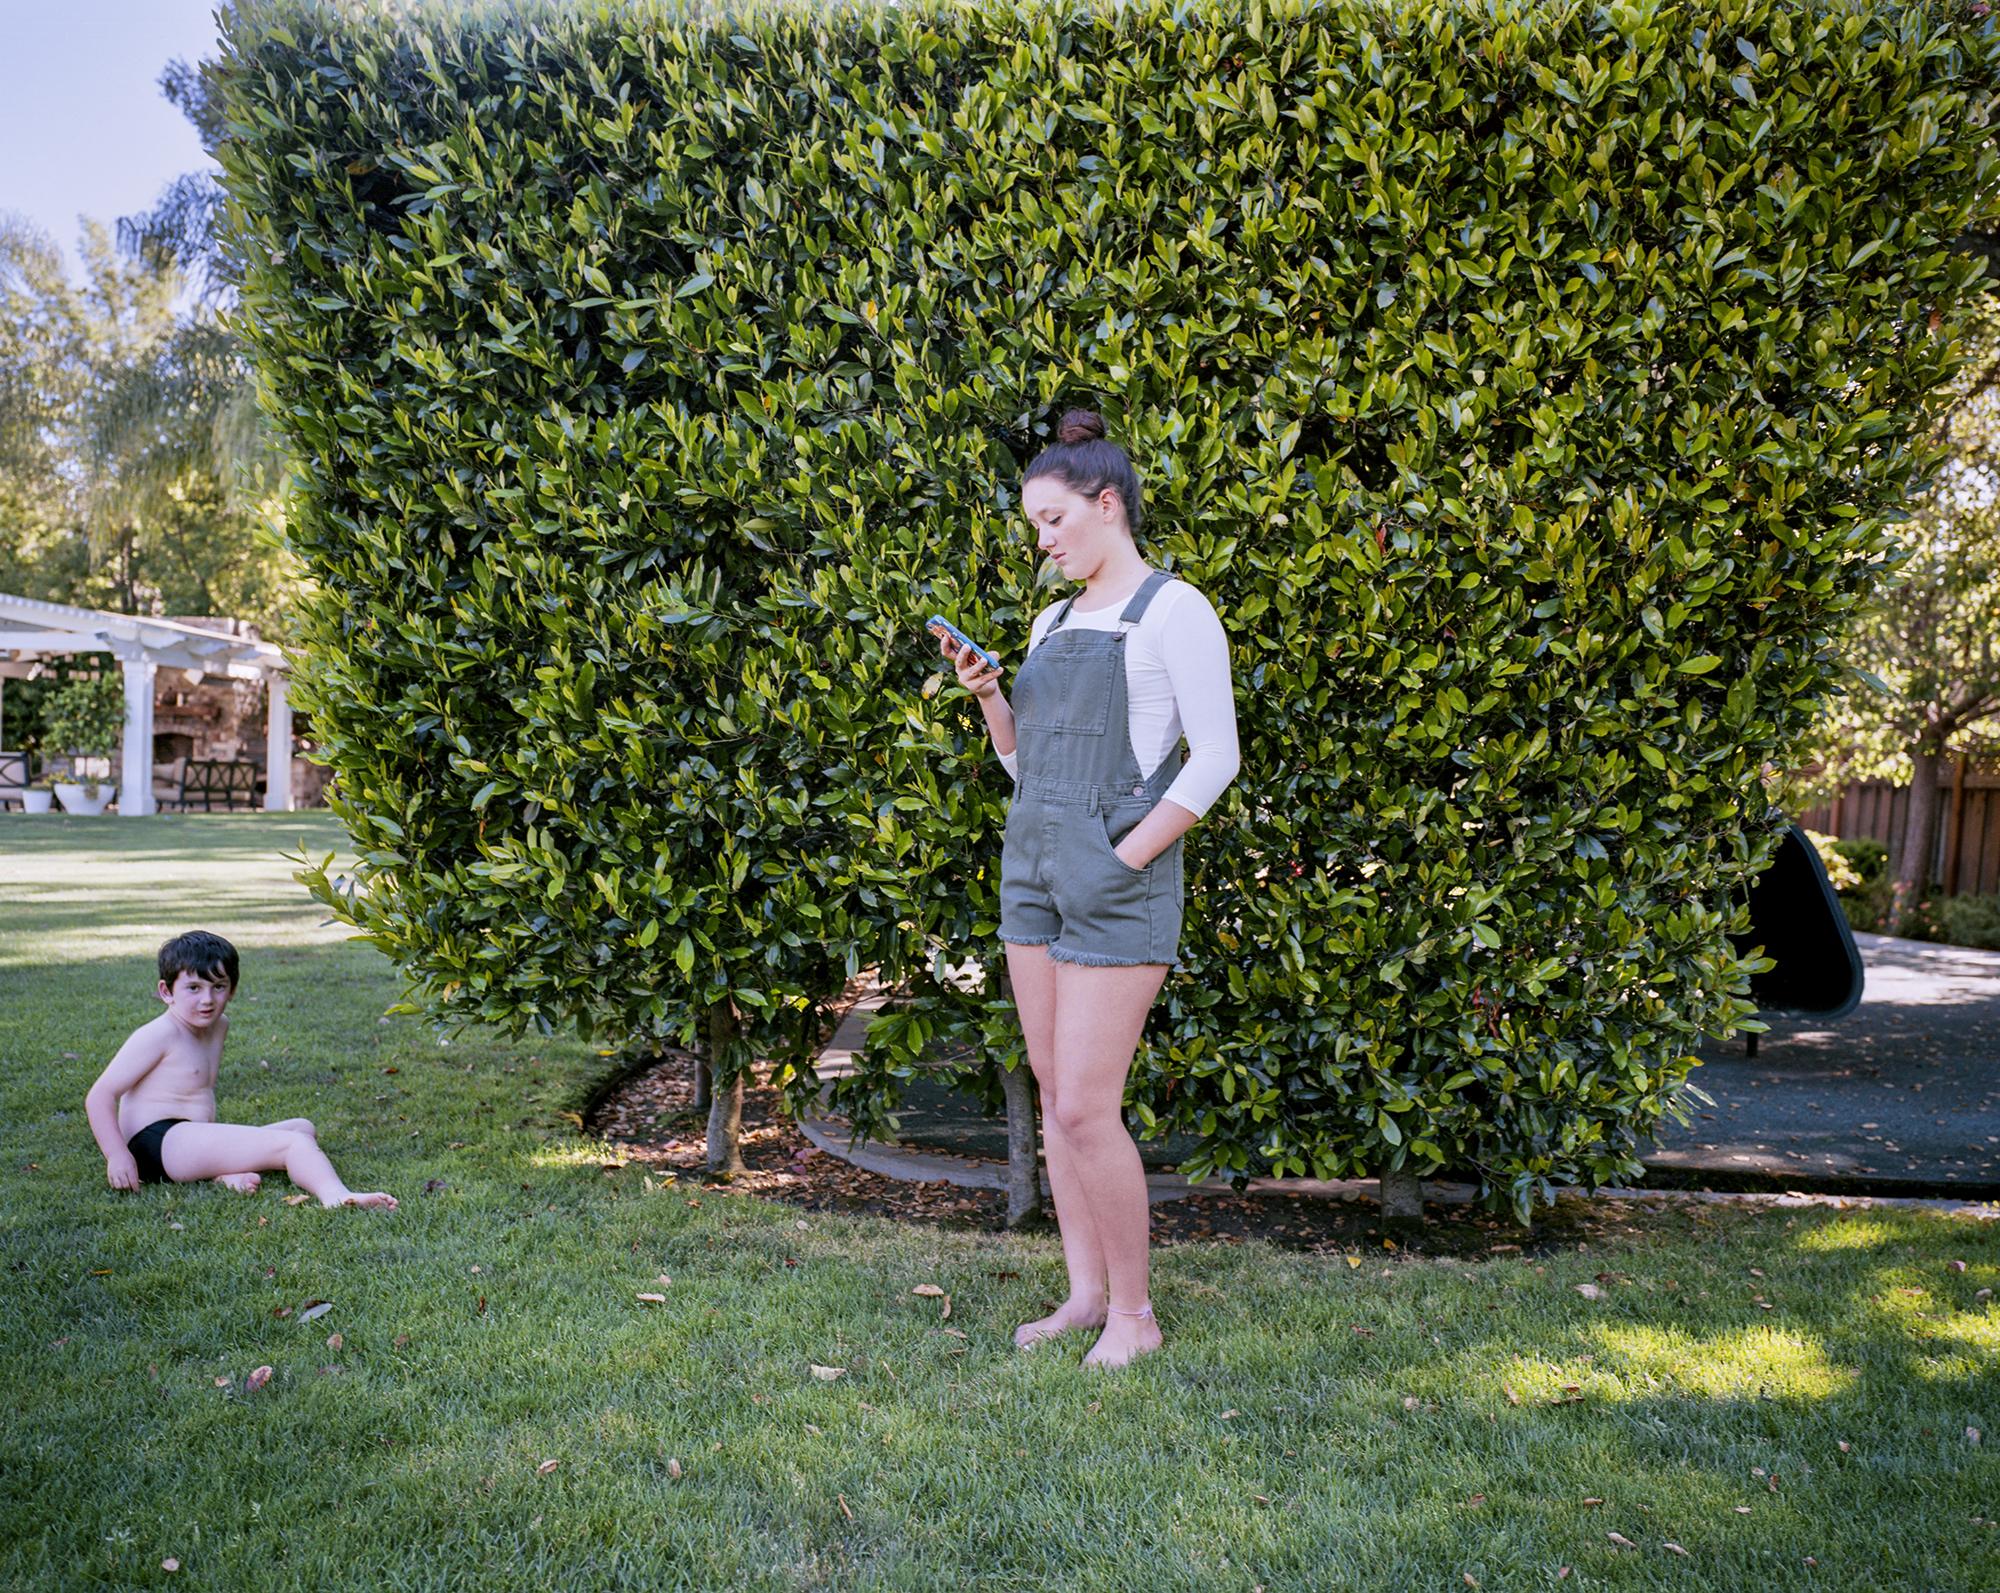 Atherton, California. June 2015.